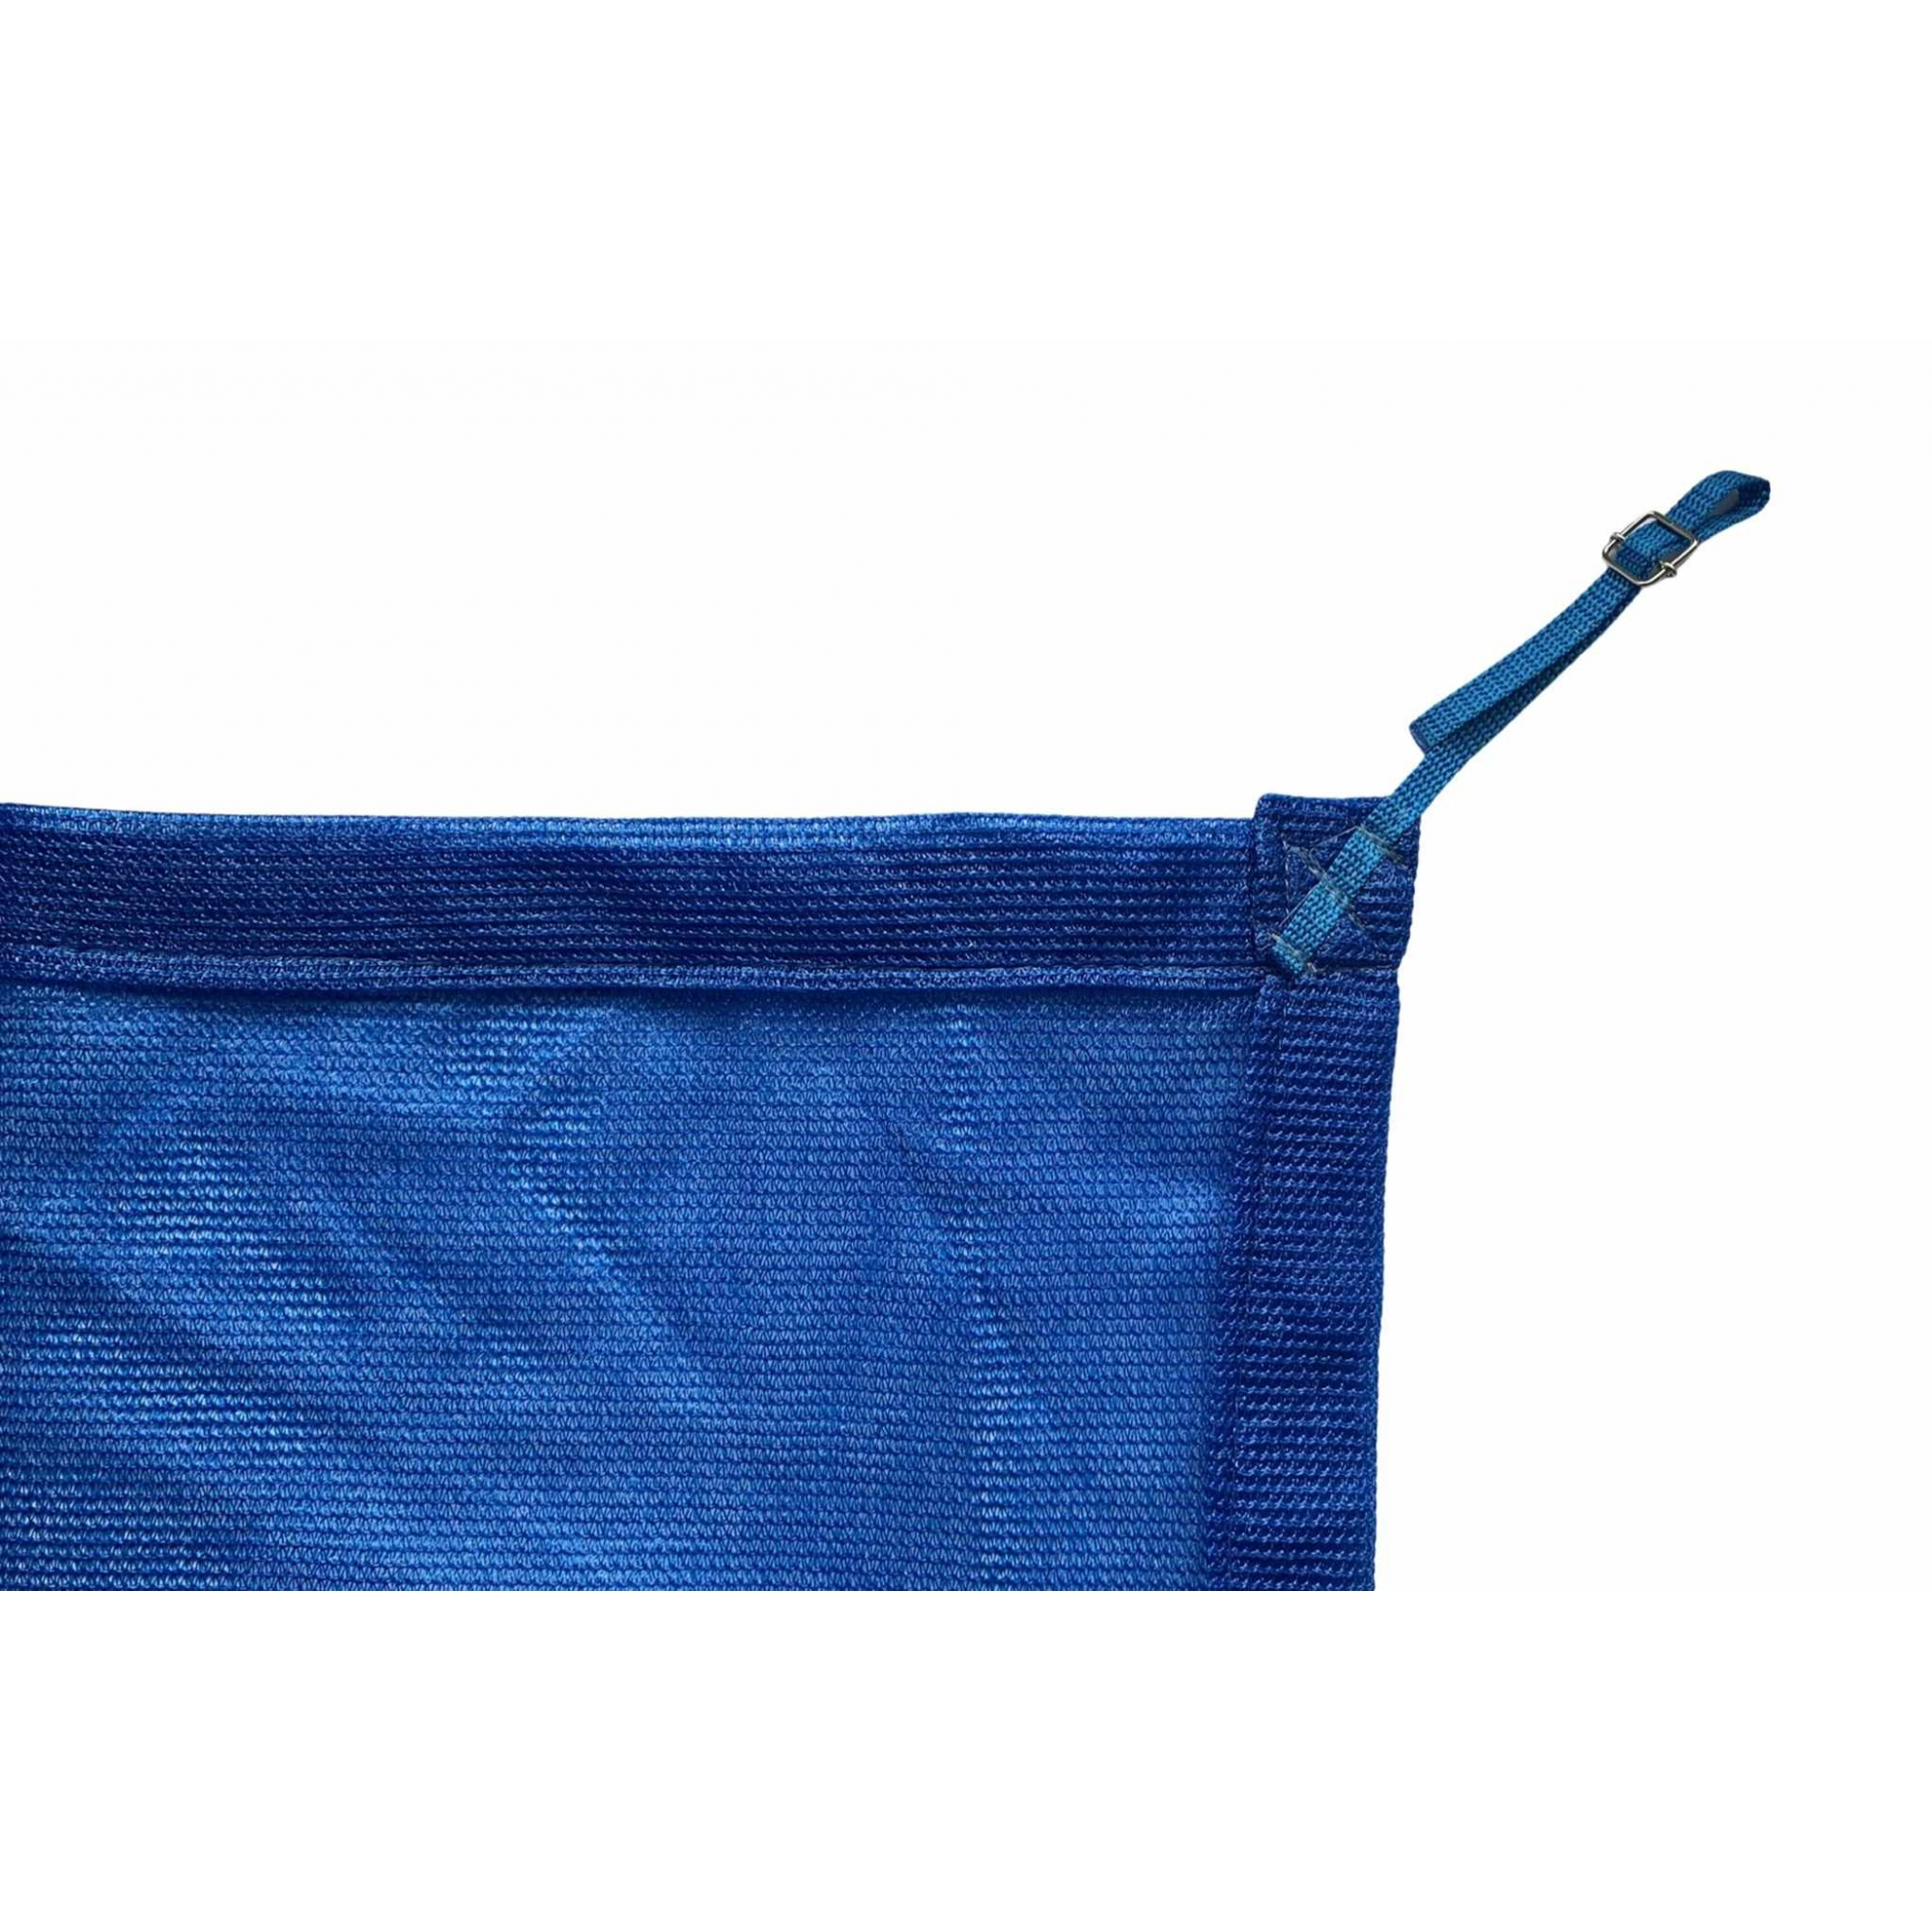 Tela de Sombreamento 80% Azul com Esticadores - Largura: 1 Metro